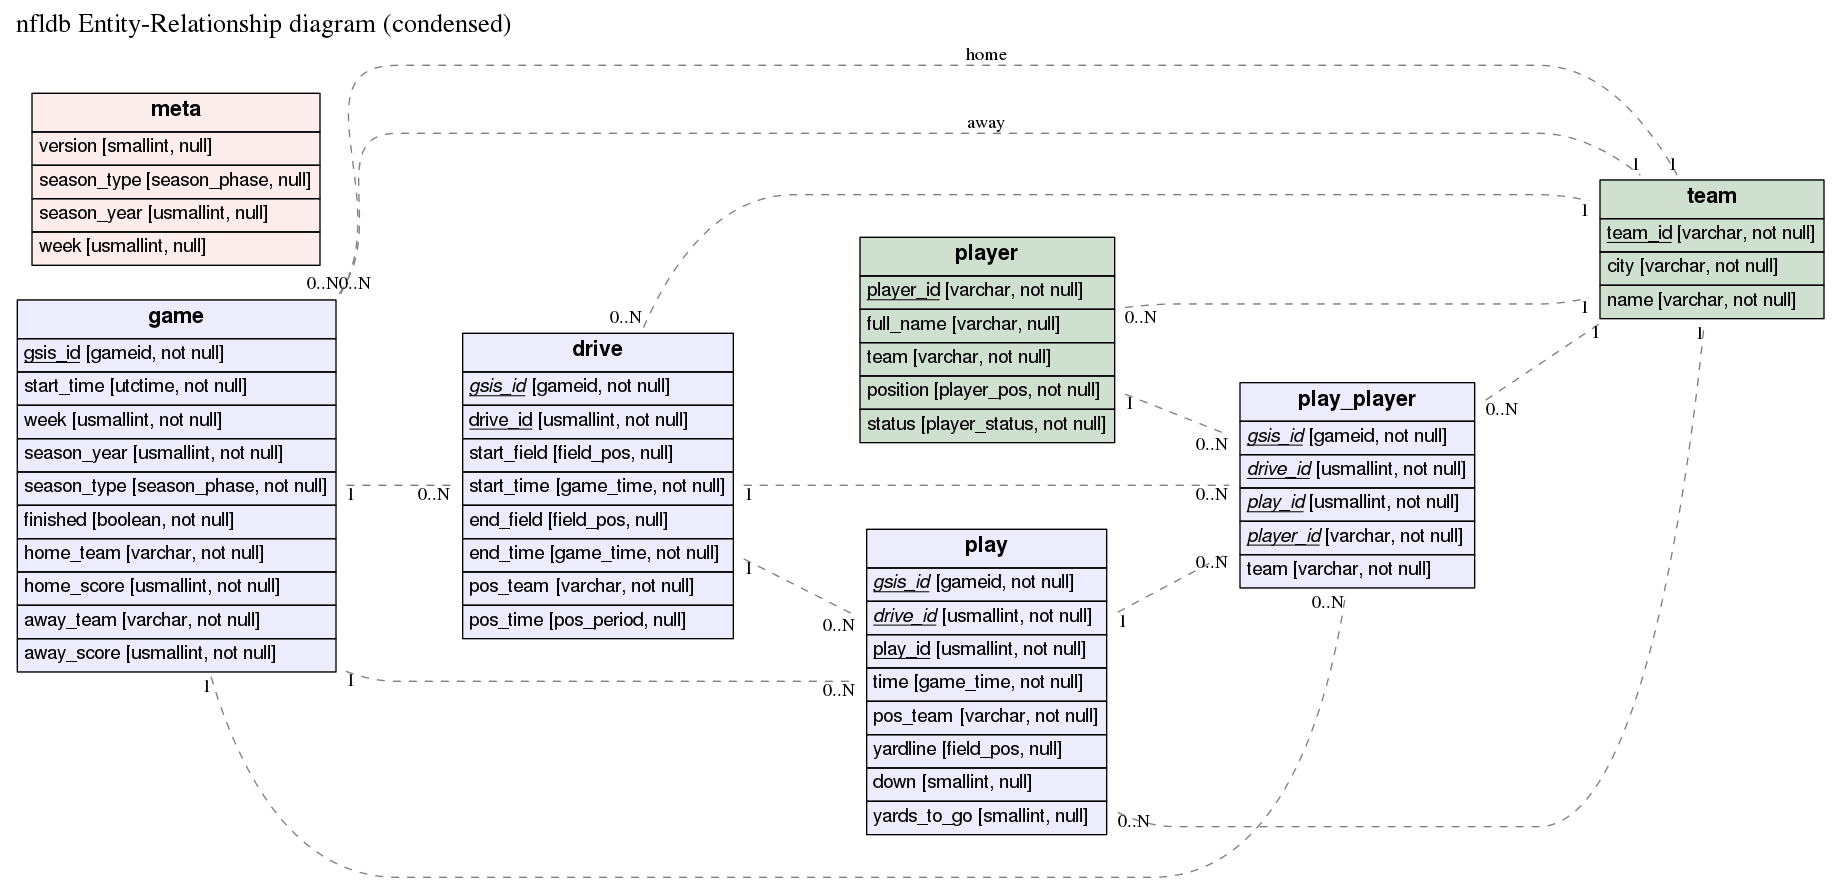 hight resolution of er diagram for nfldb